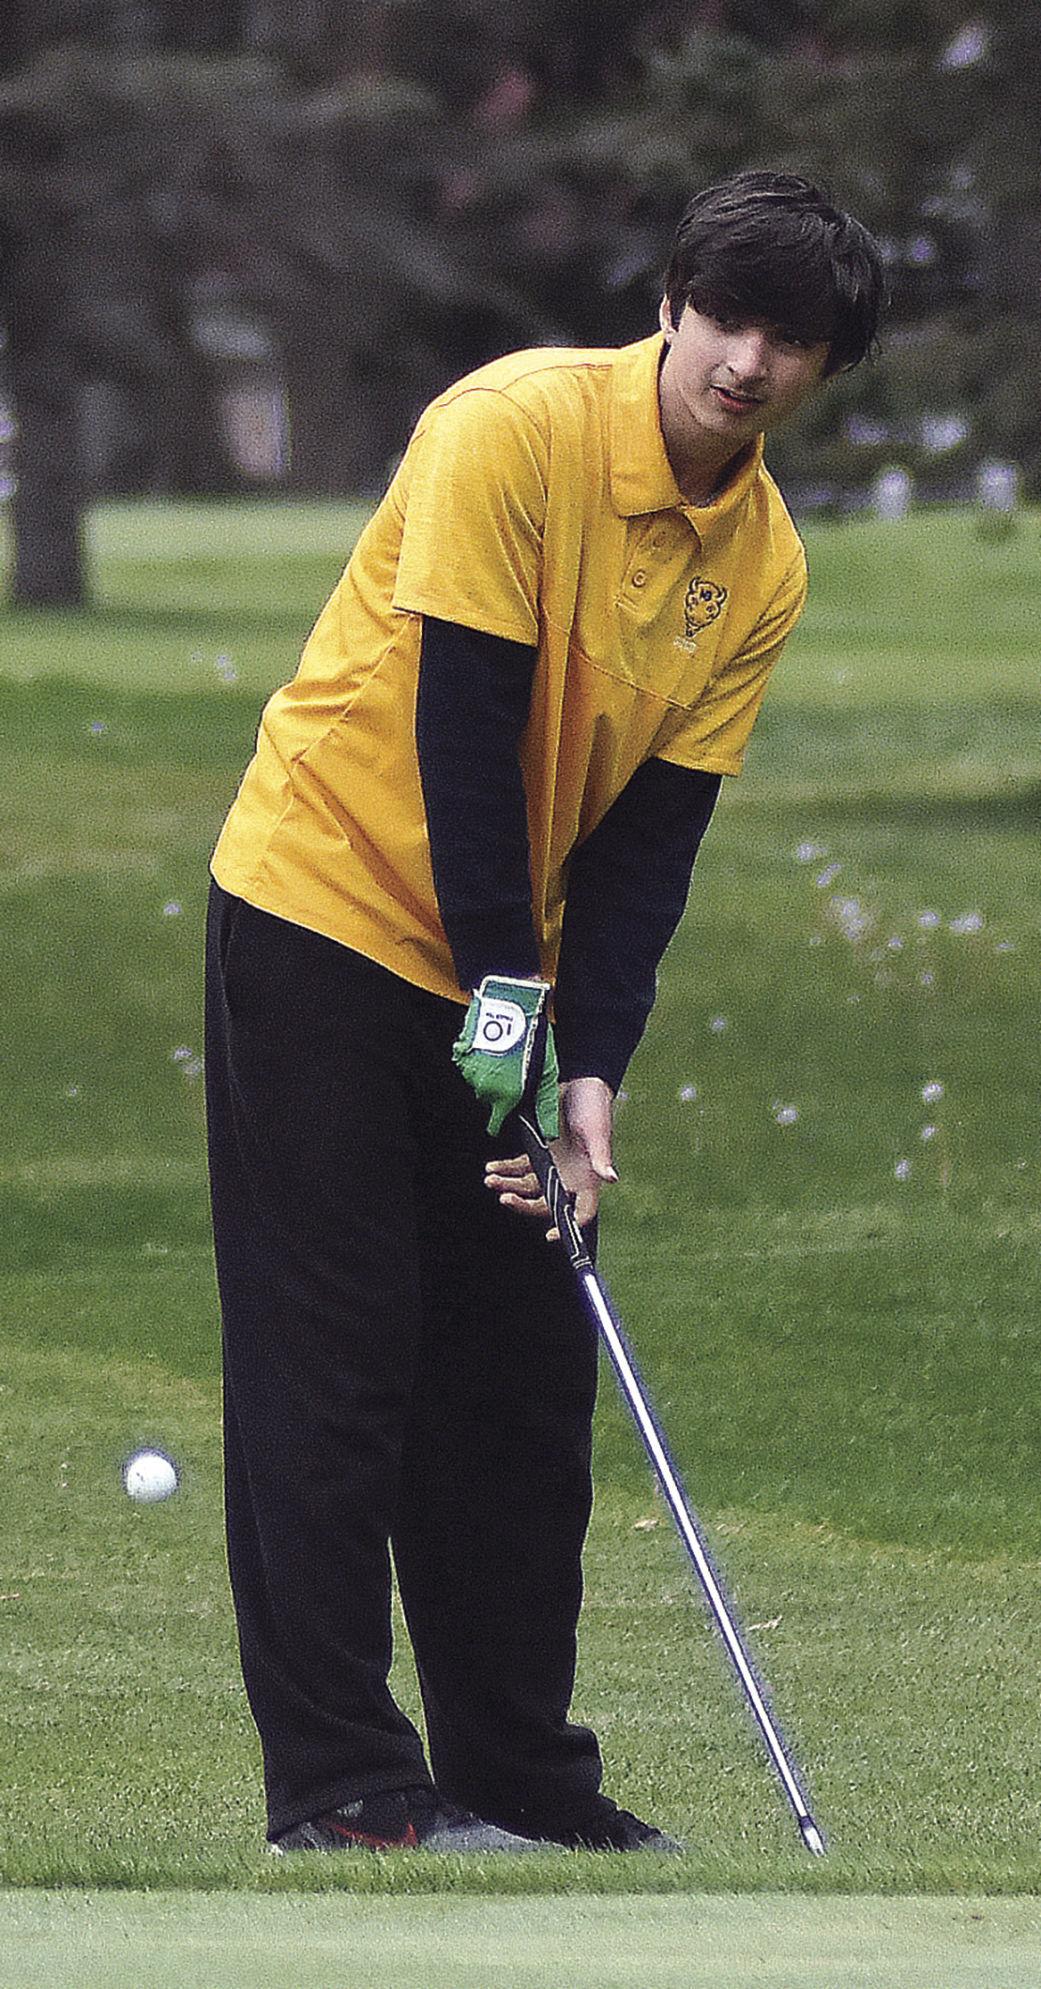 5 13 Sports Golf 2 NB Moser putts.jpg